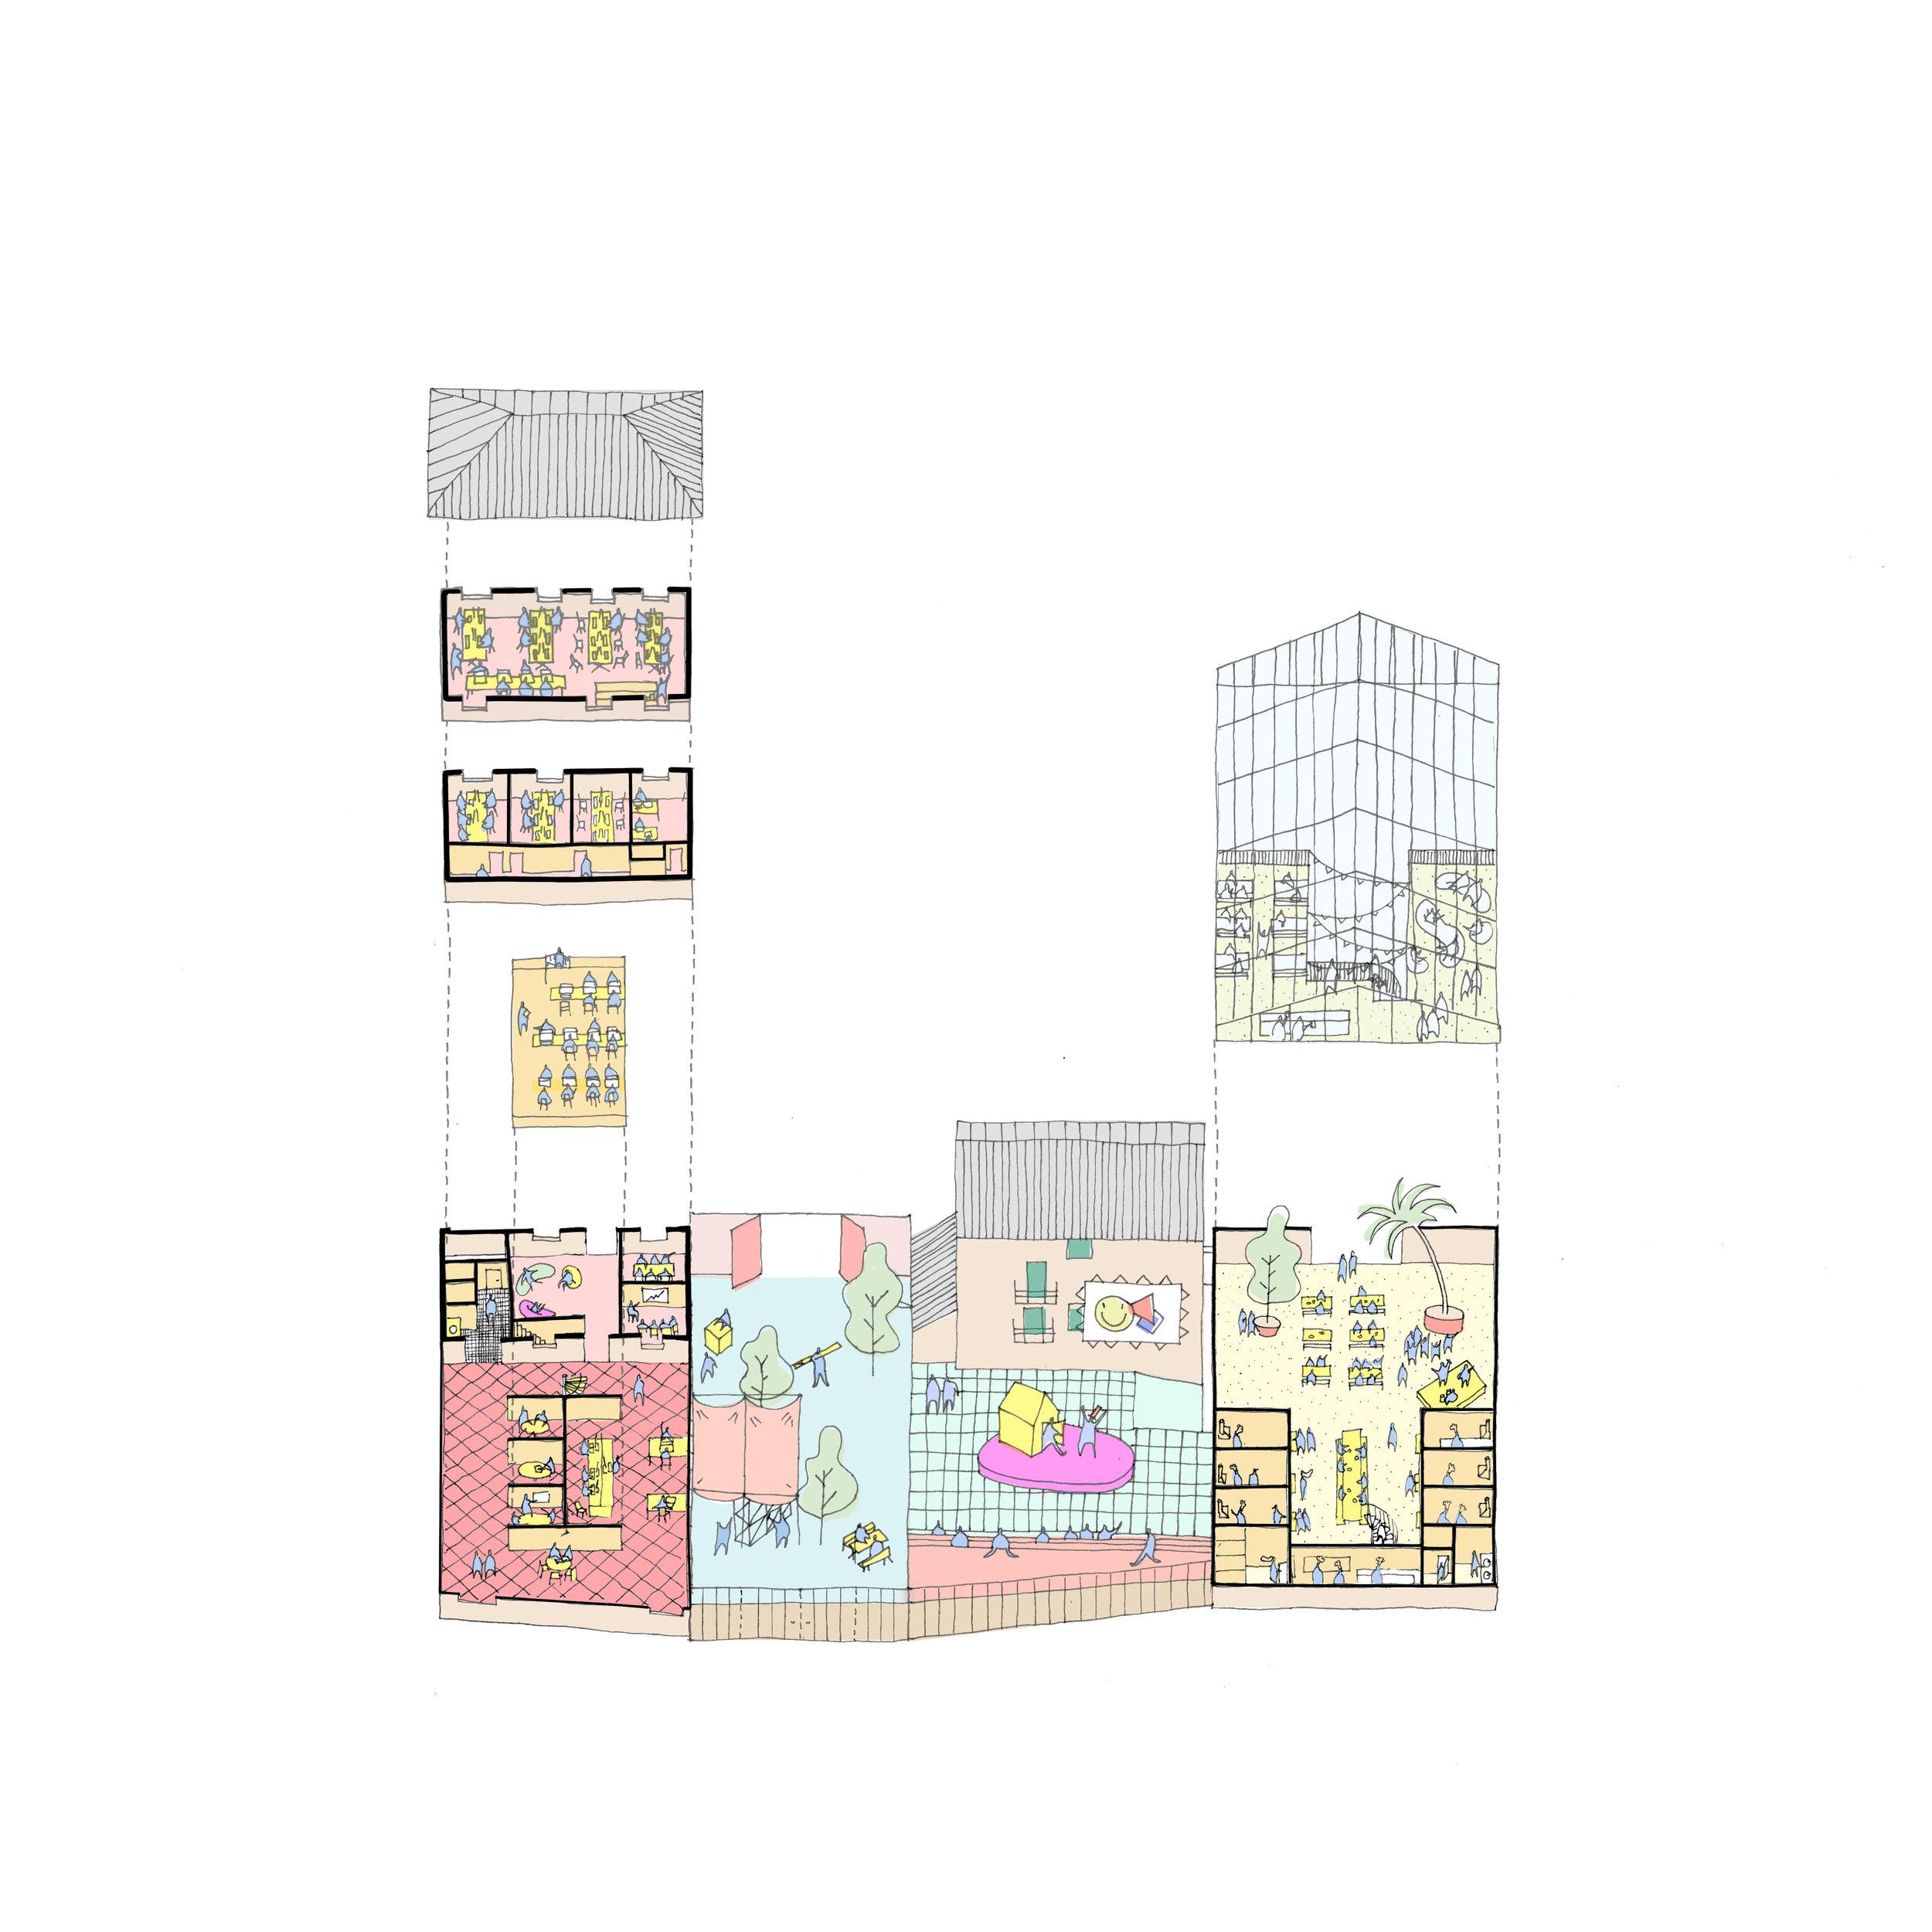 Coachworks Ashford, concept diagram - Exploded drawing